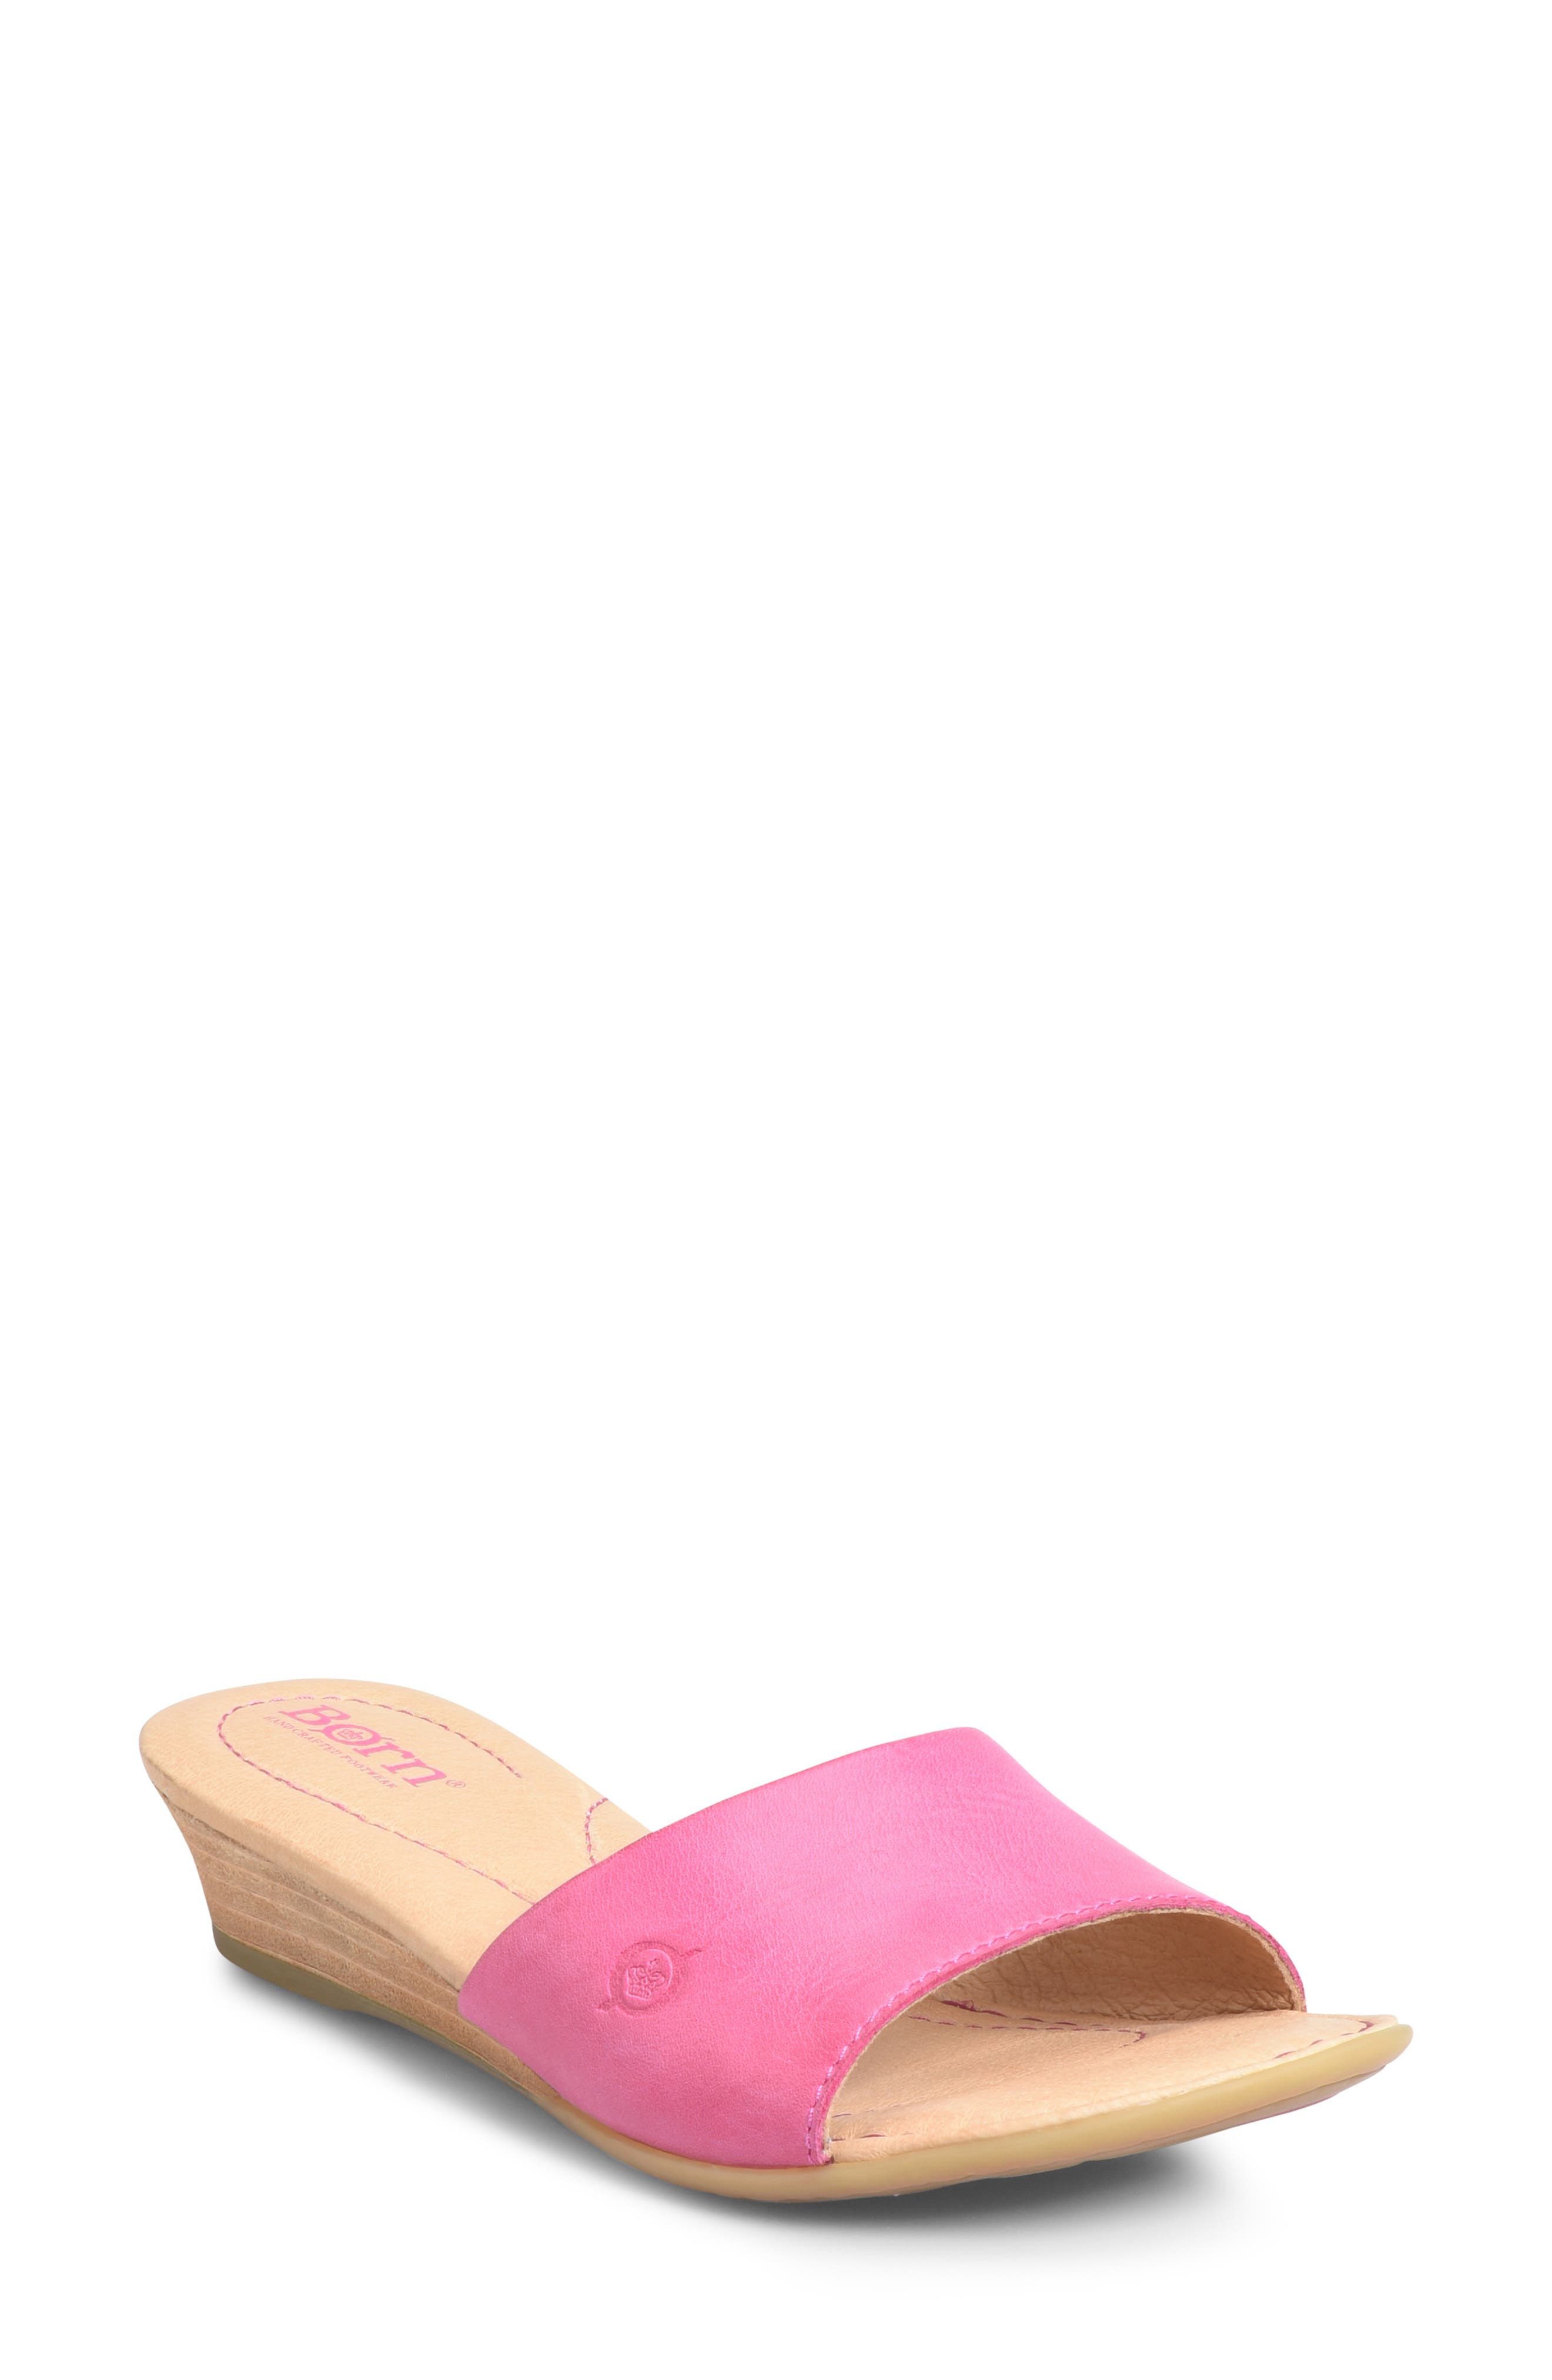 B?rn Shasta Wedge Slide Sandal, Pink